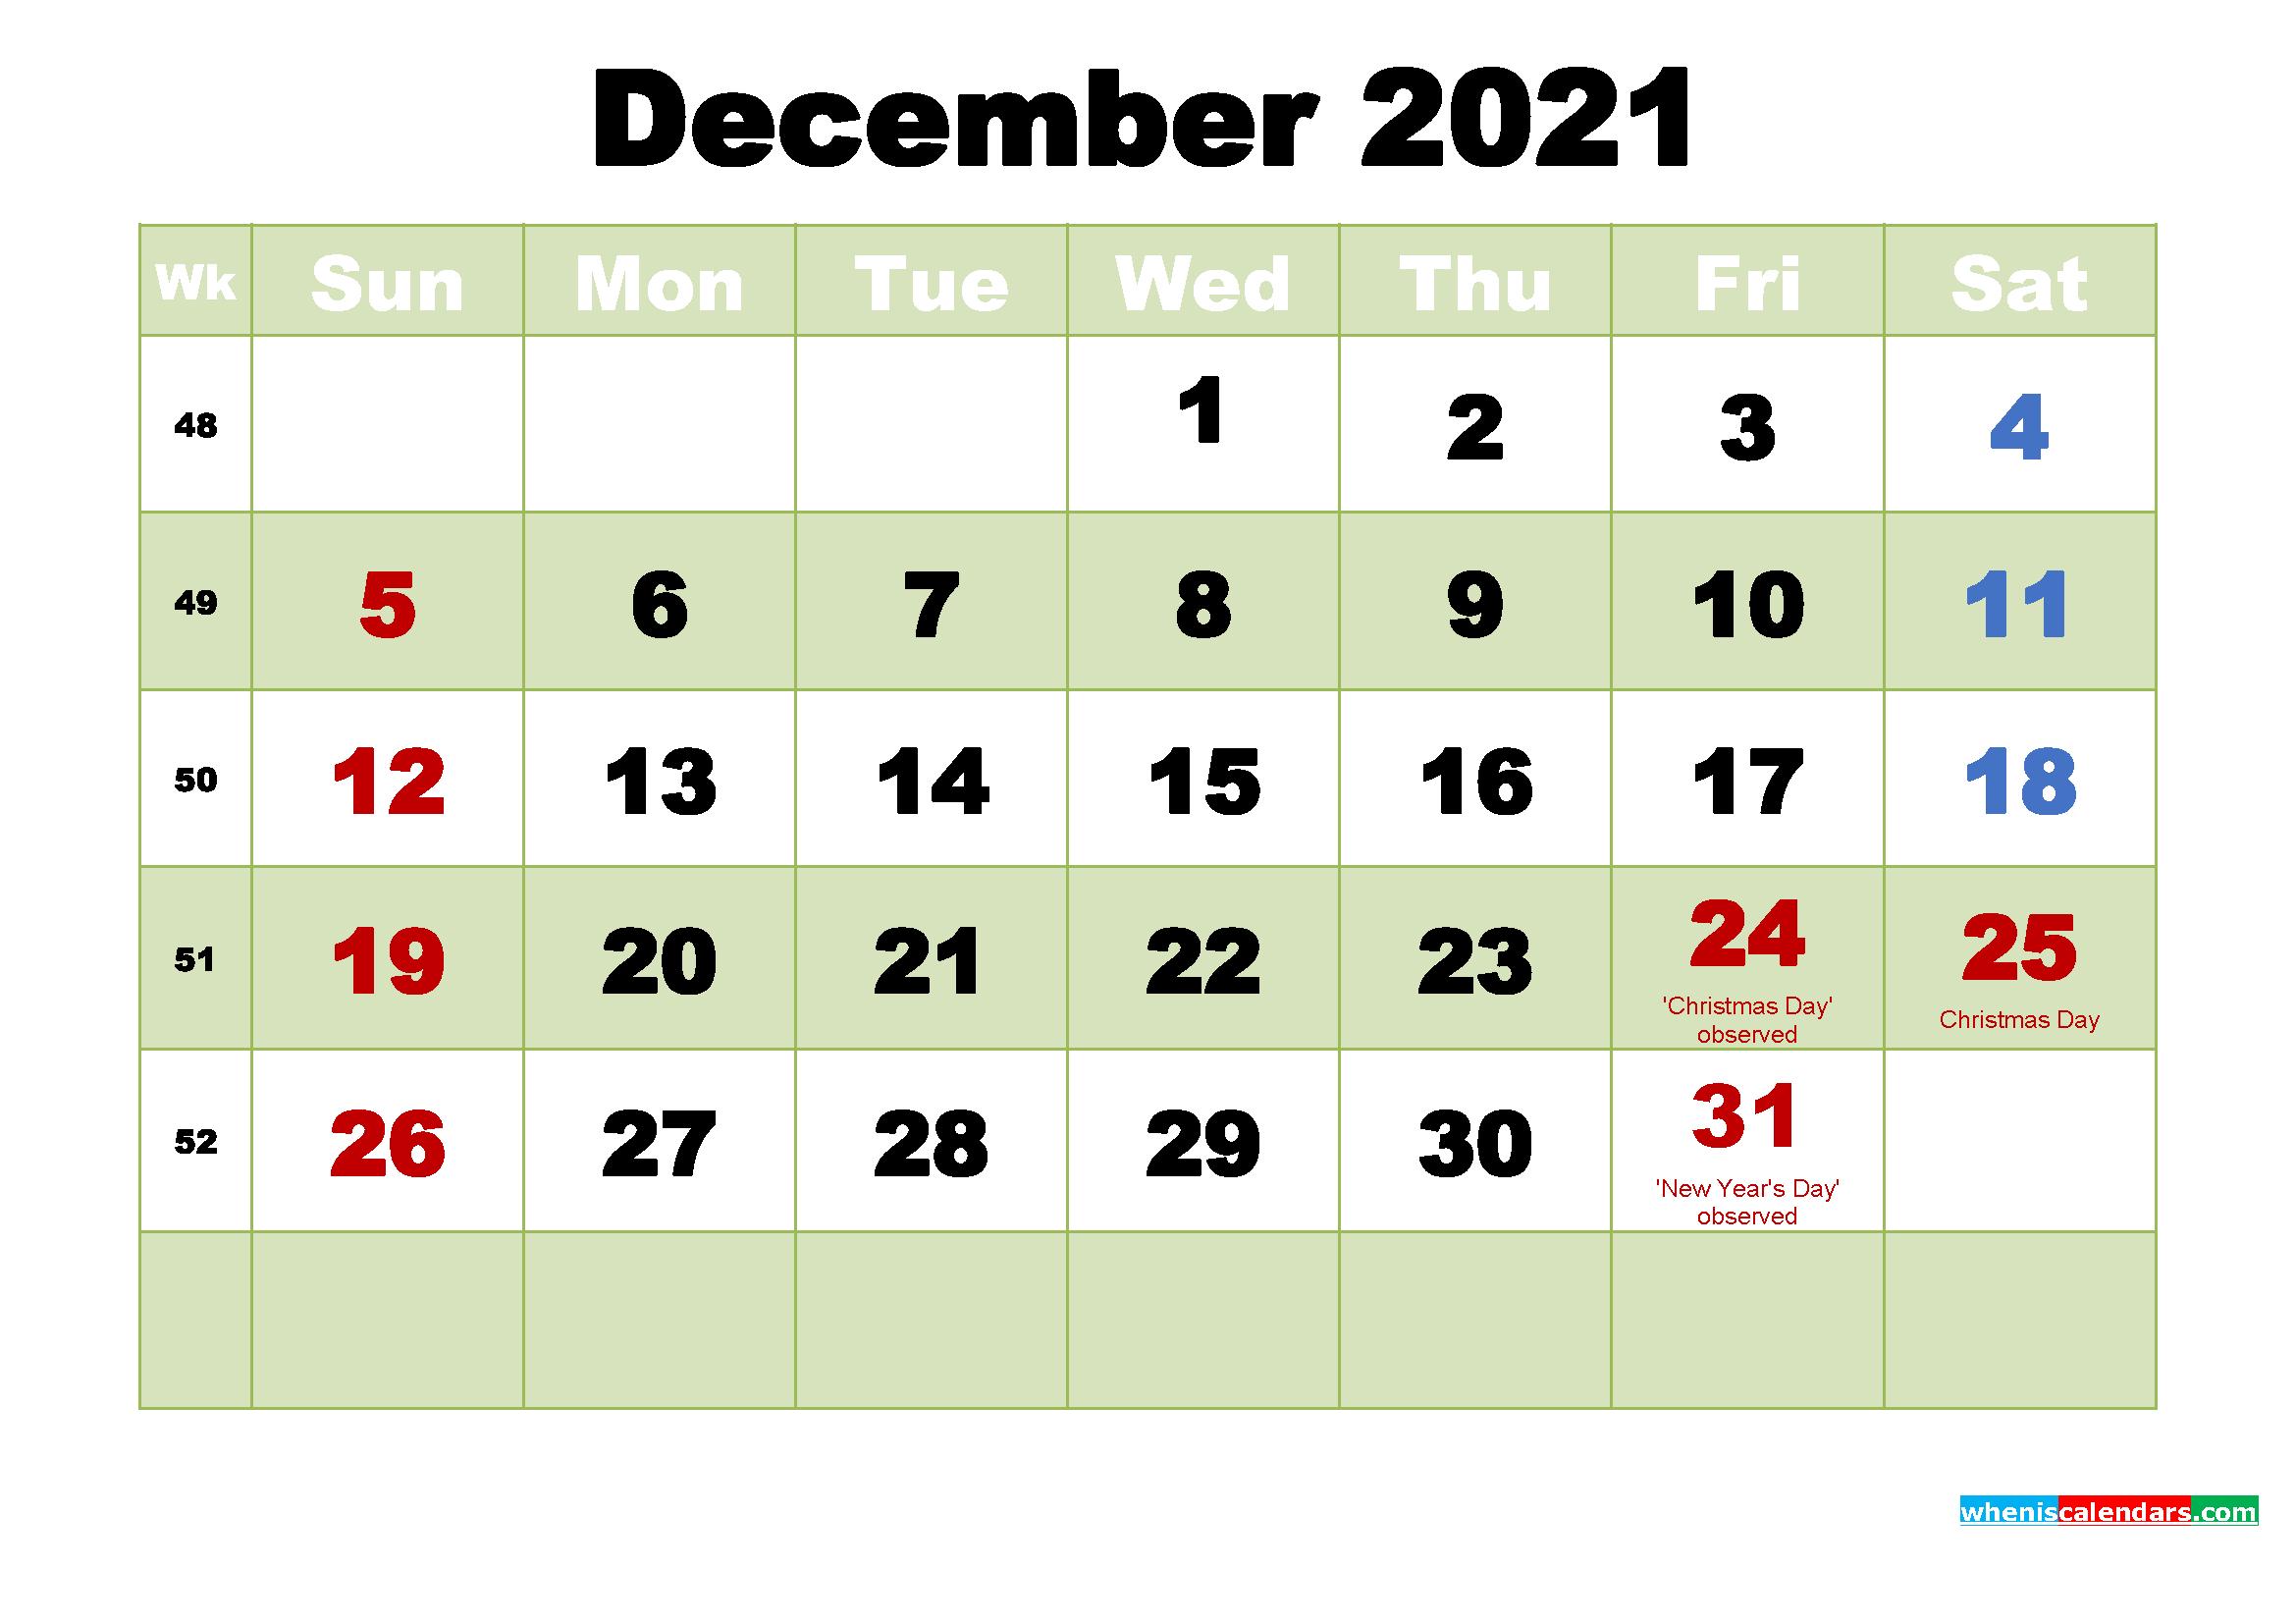 Free December 2021 Printable Calendar Template Word, Pdf - Free Printable 2021 Calendar With